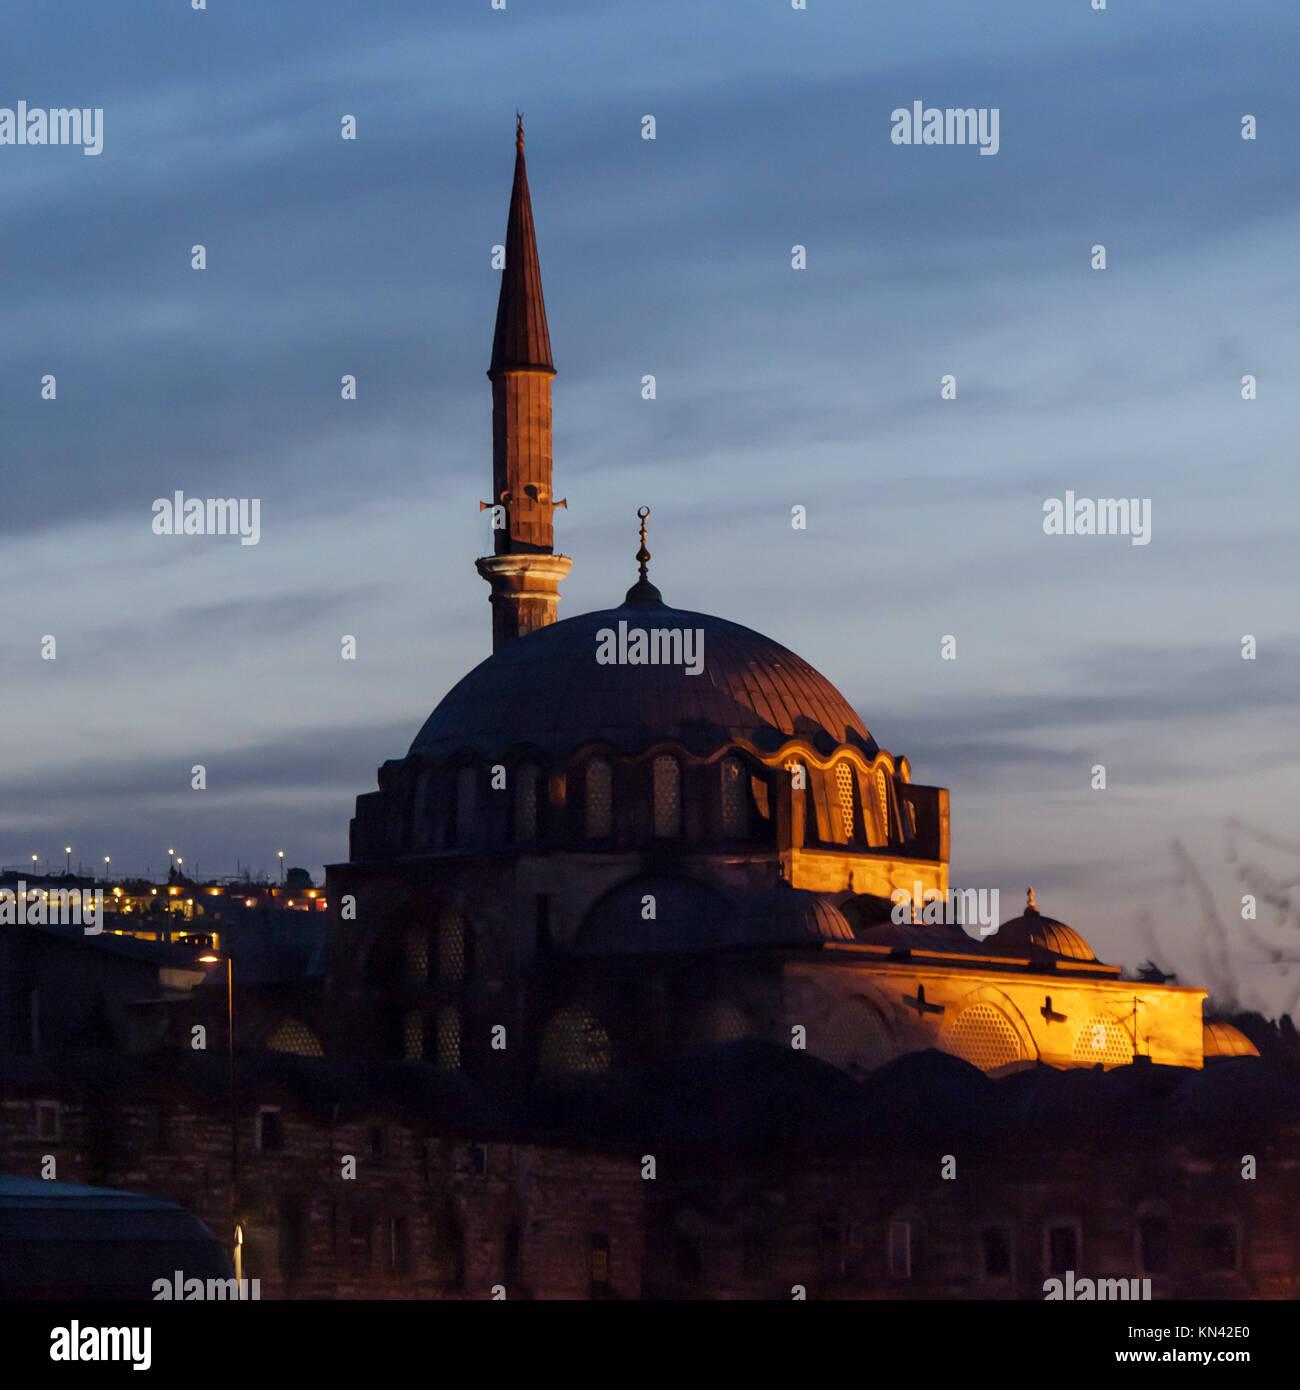 Rustem Pasha Mosque at sunset, Istanbul, Turkey. - Stock Image